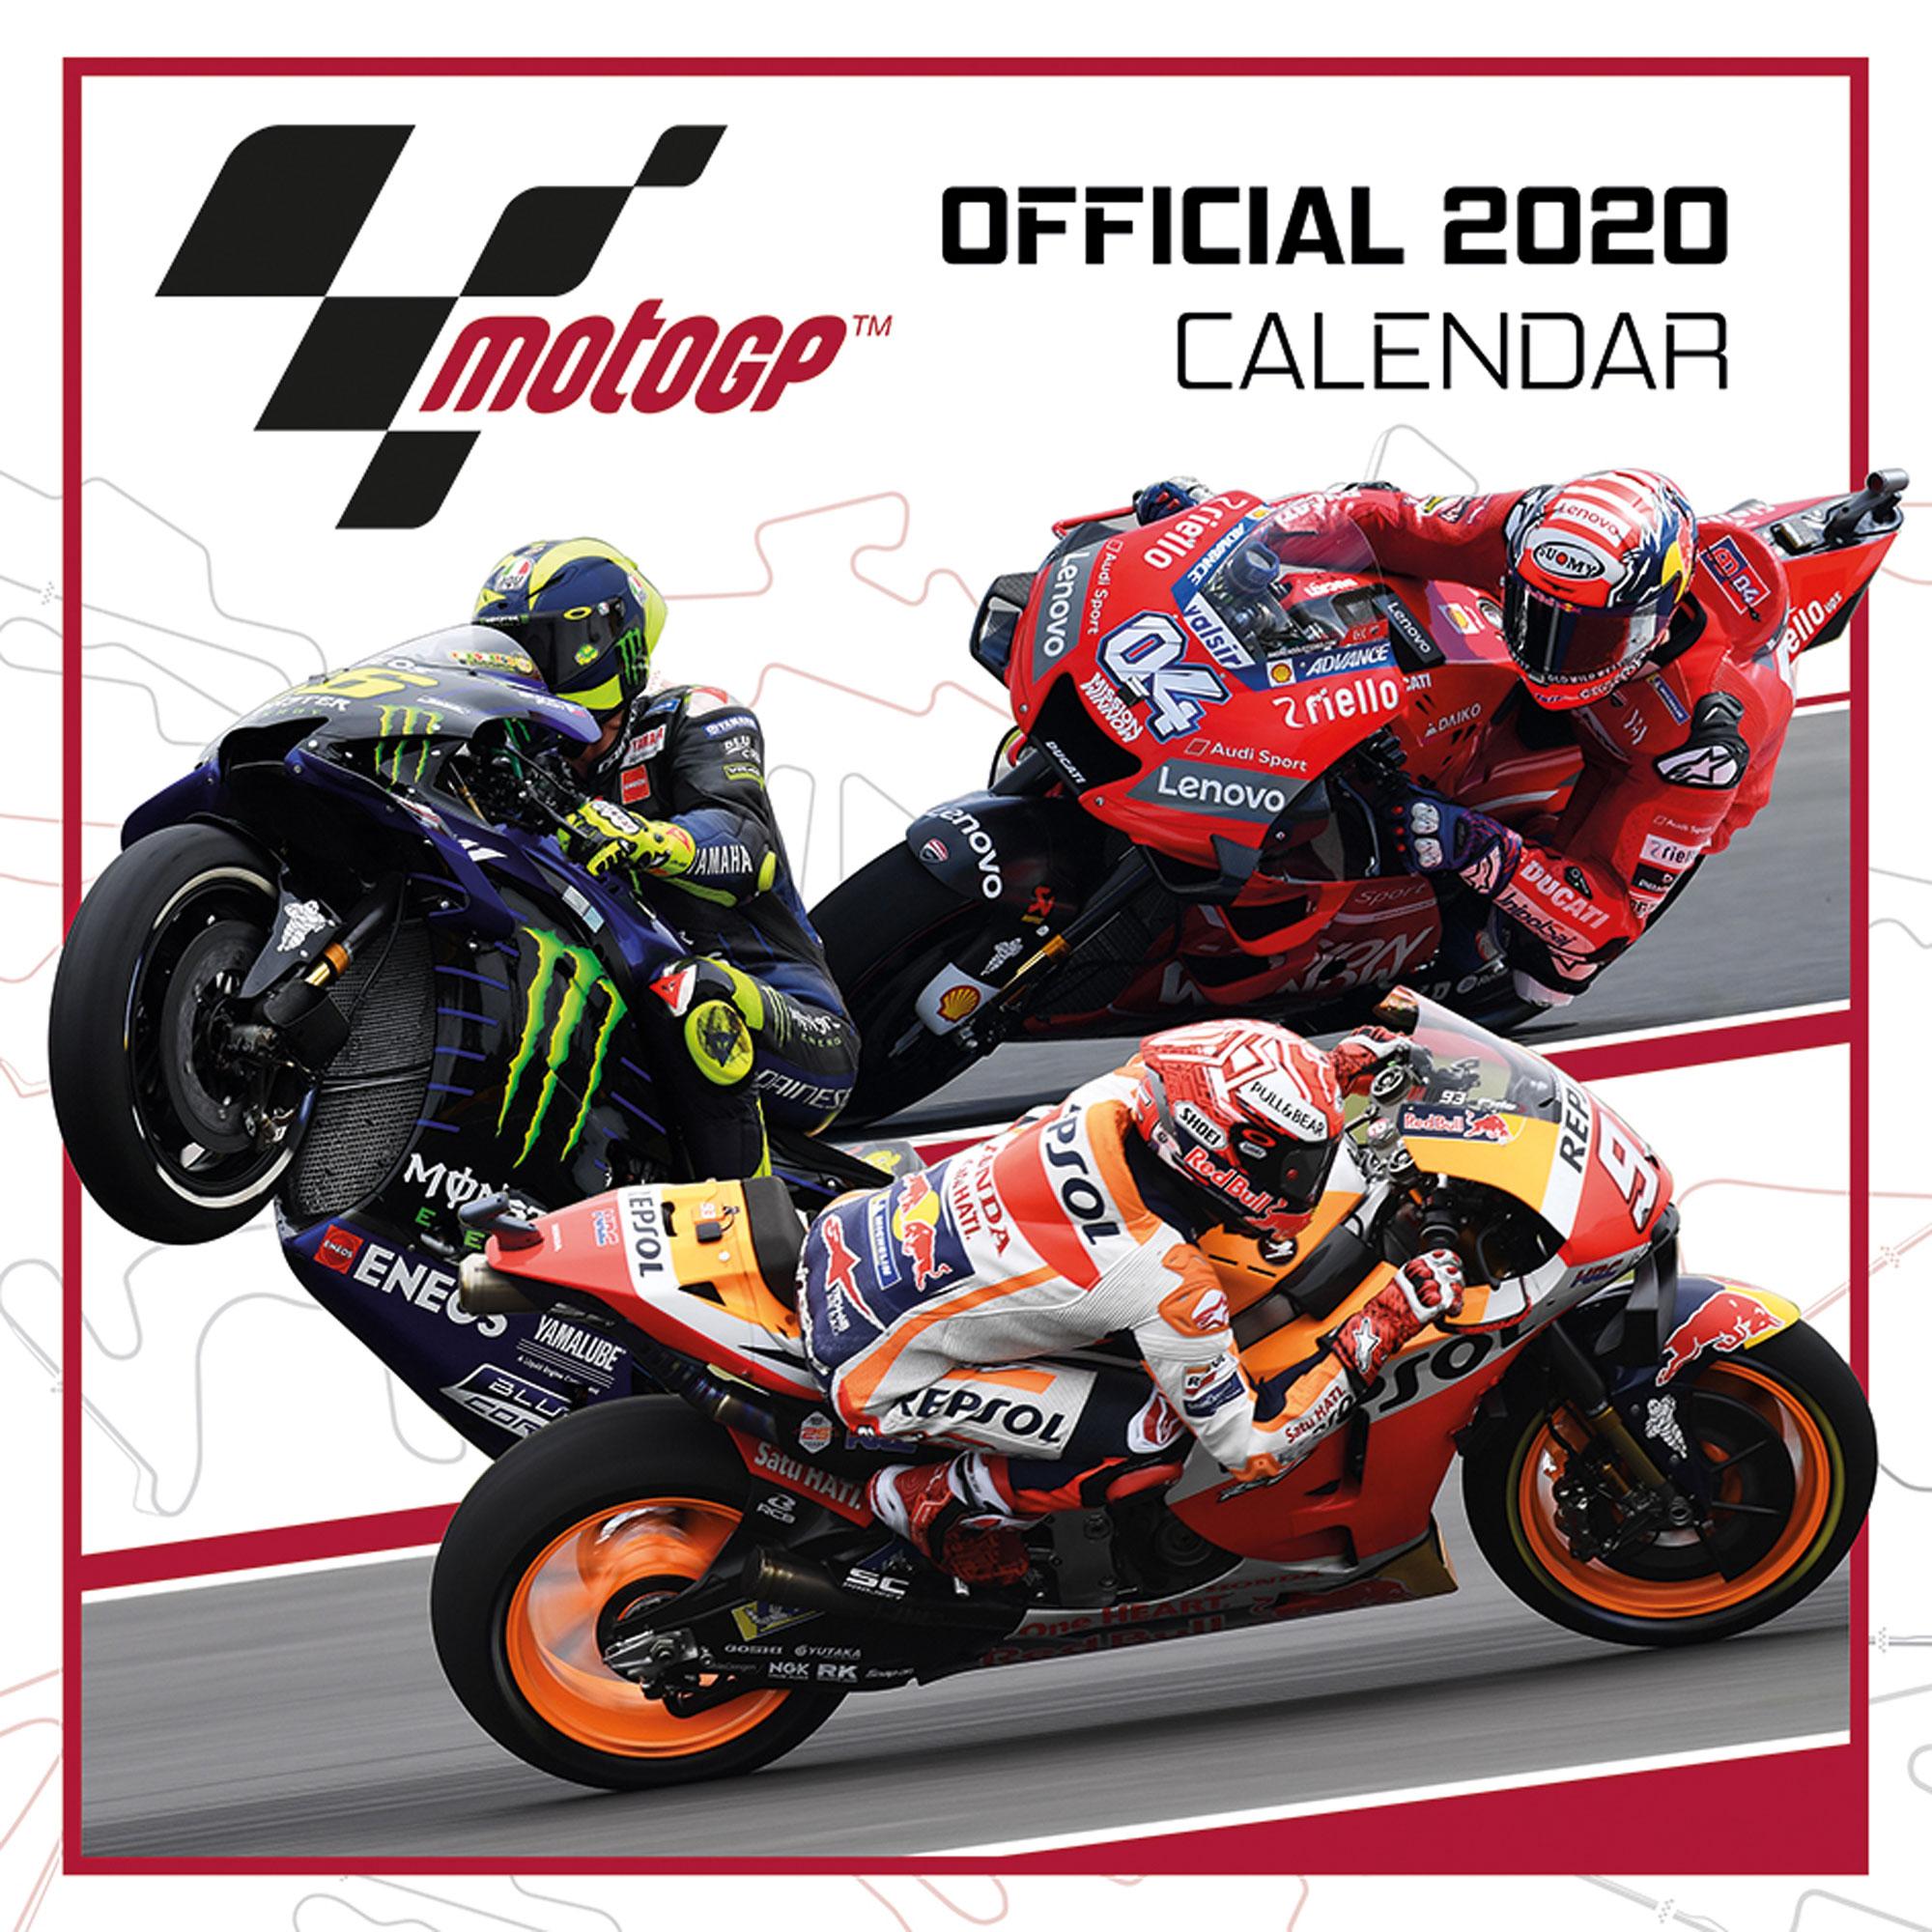 Gp Kalender